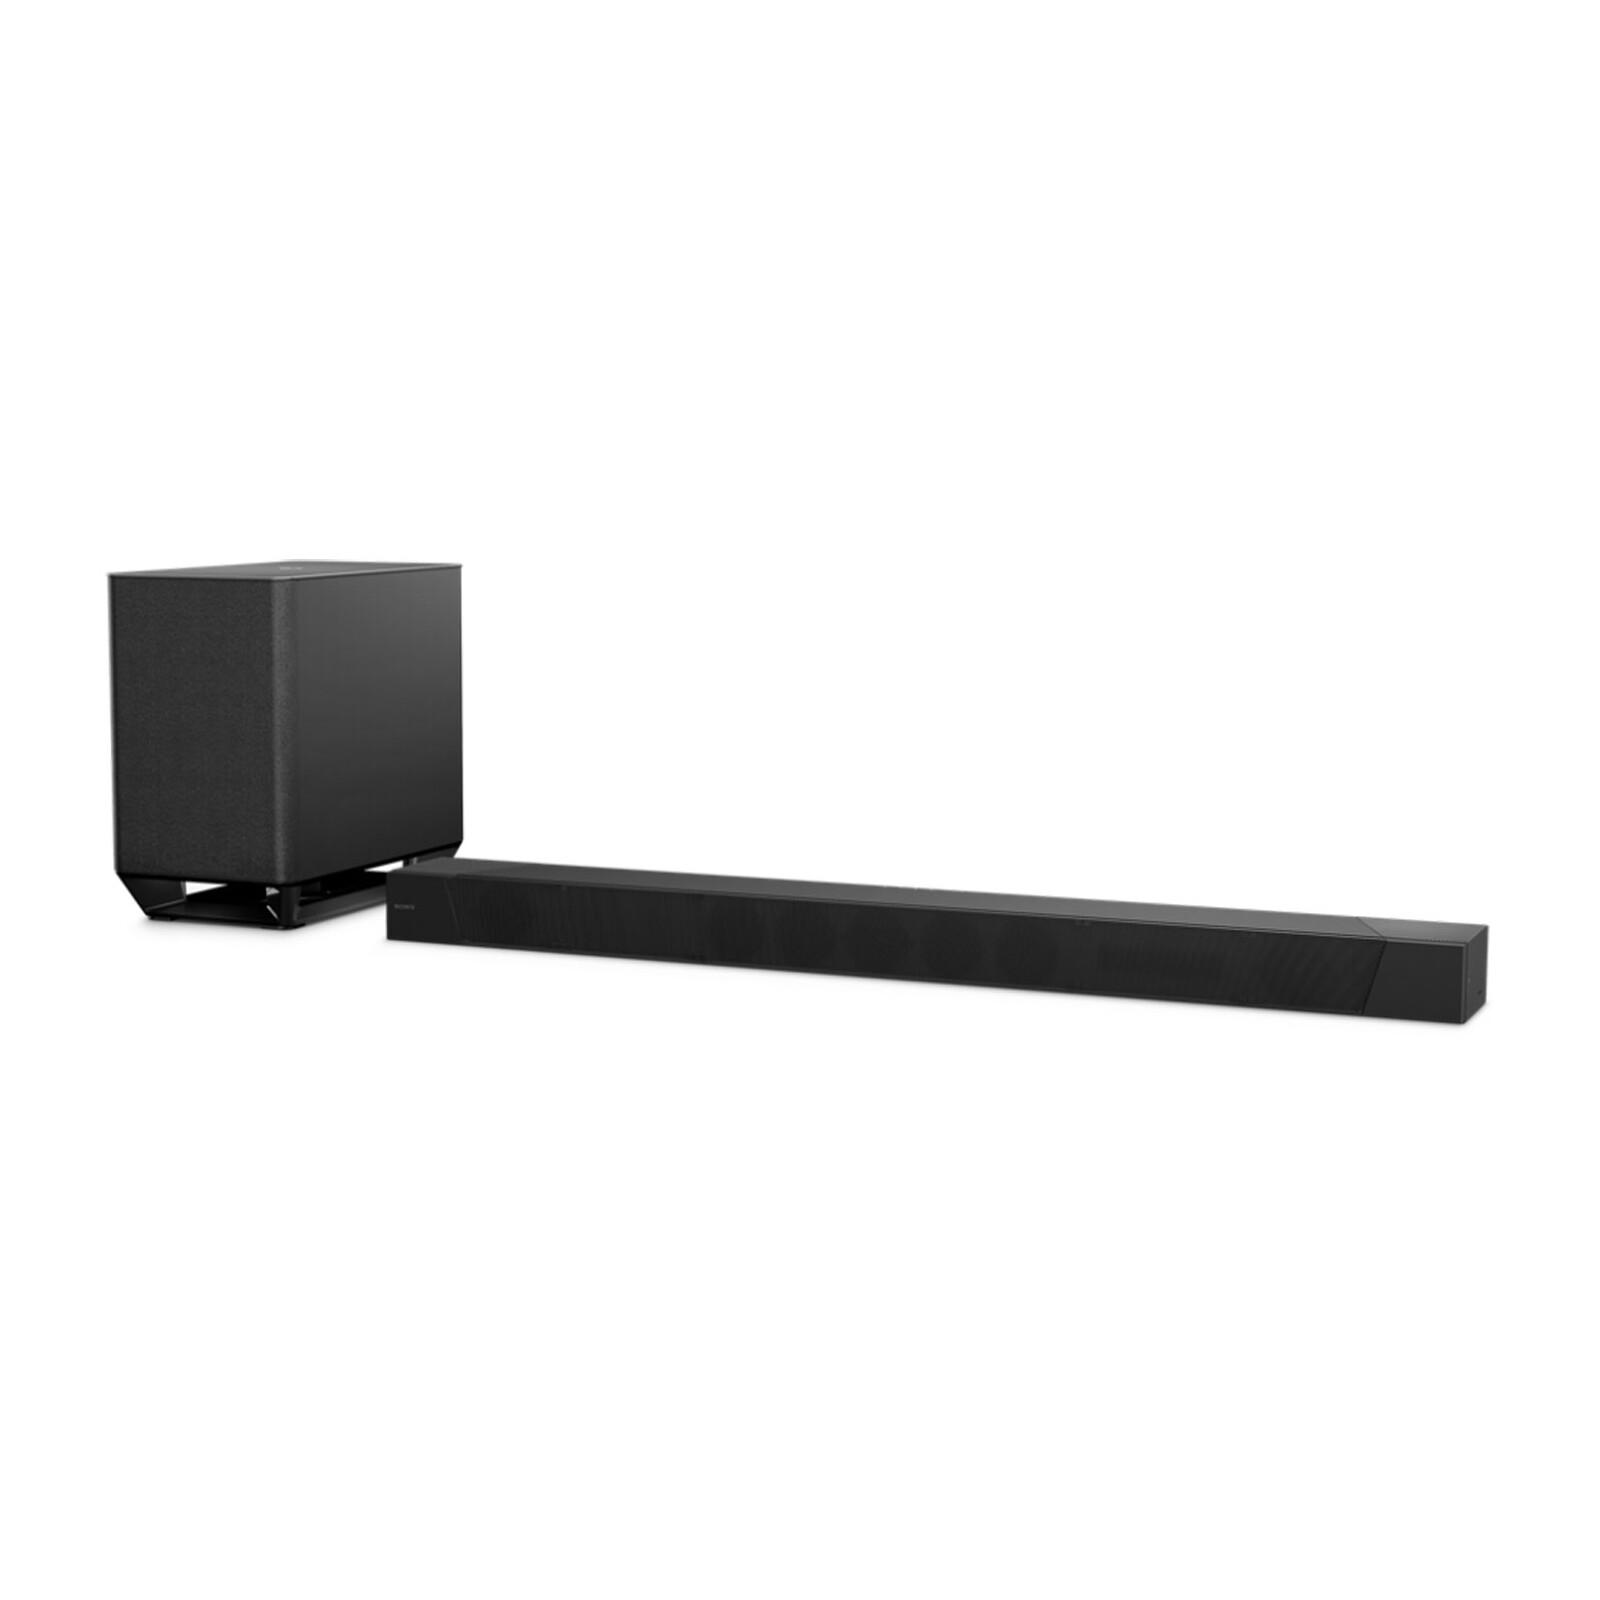 Sony HTS-T5000 Sound Bar